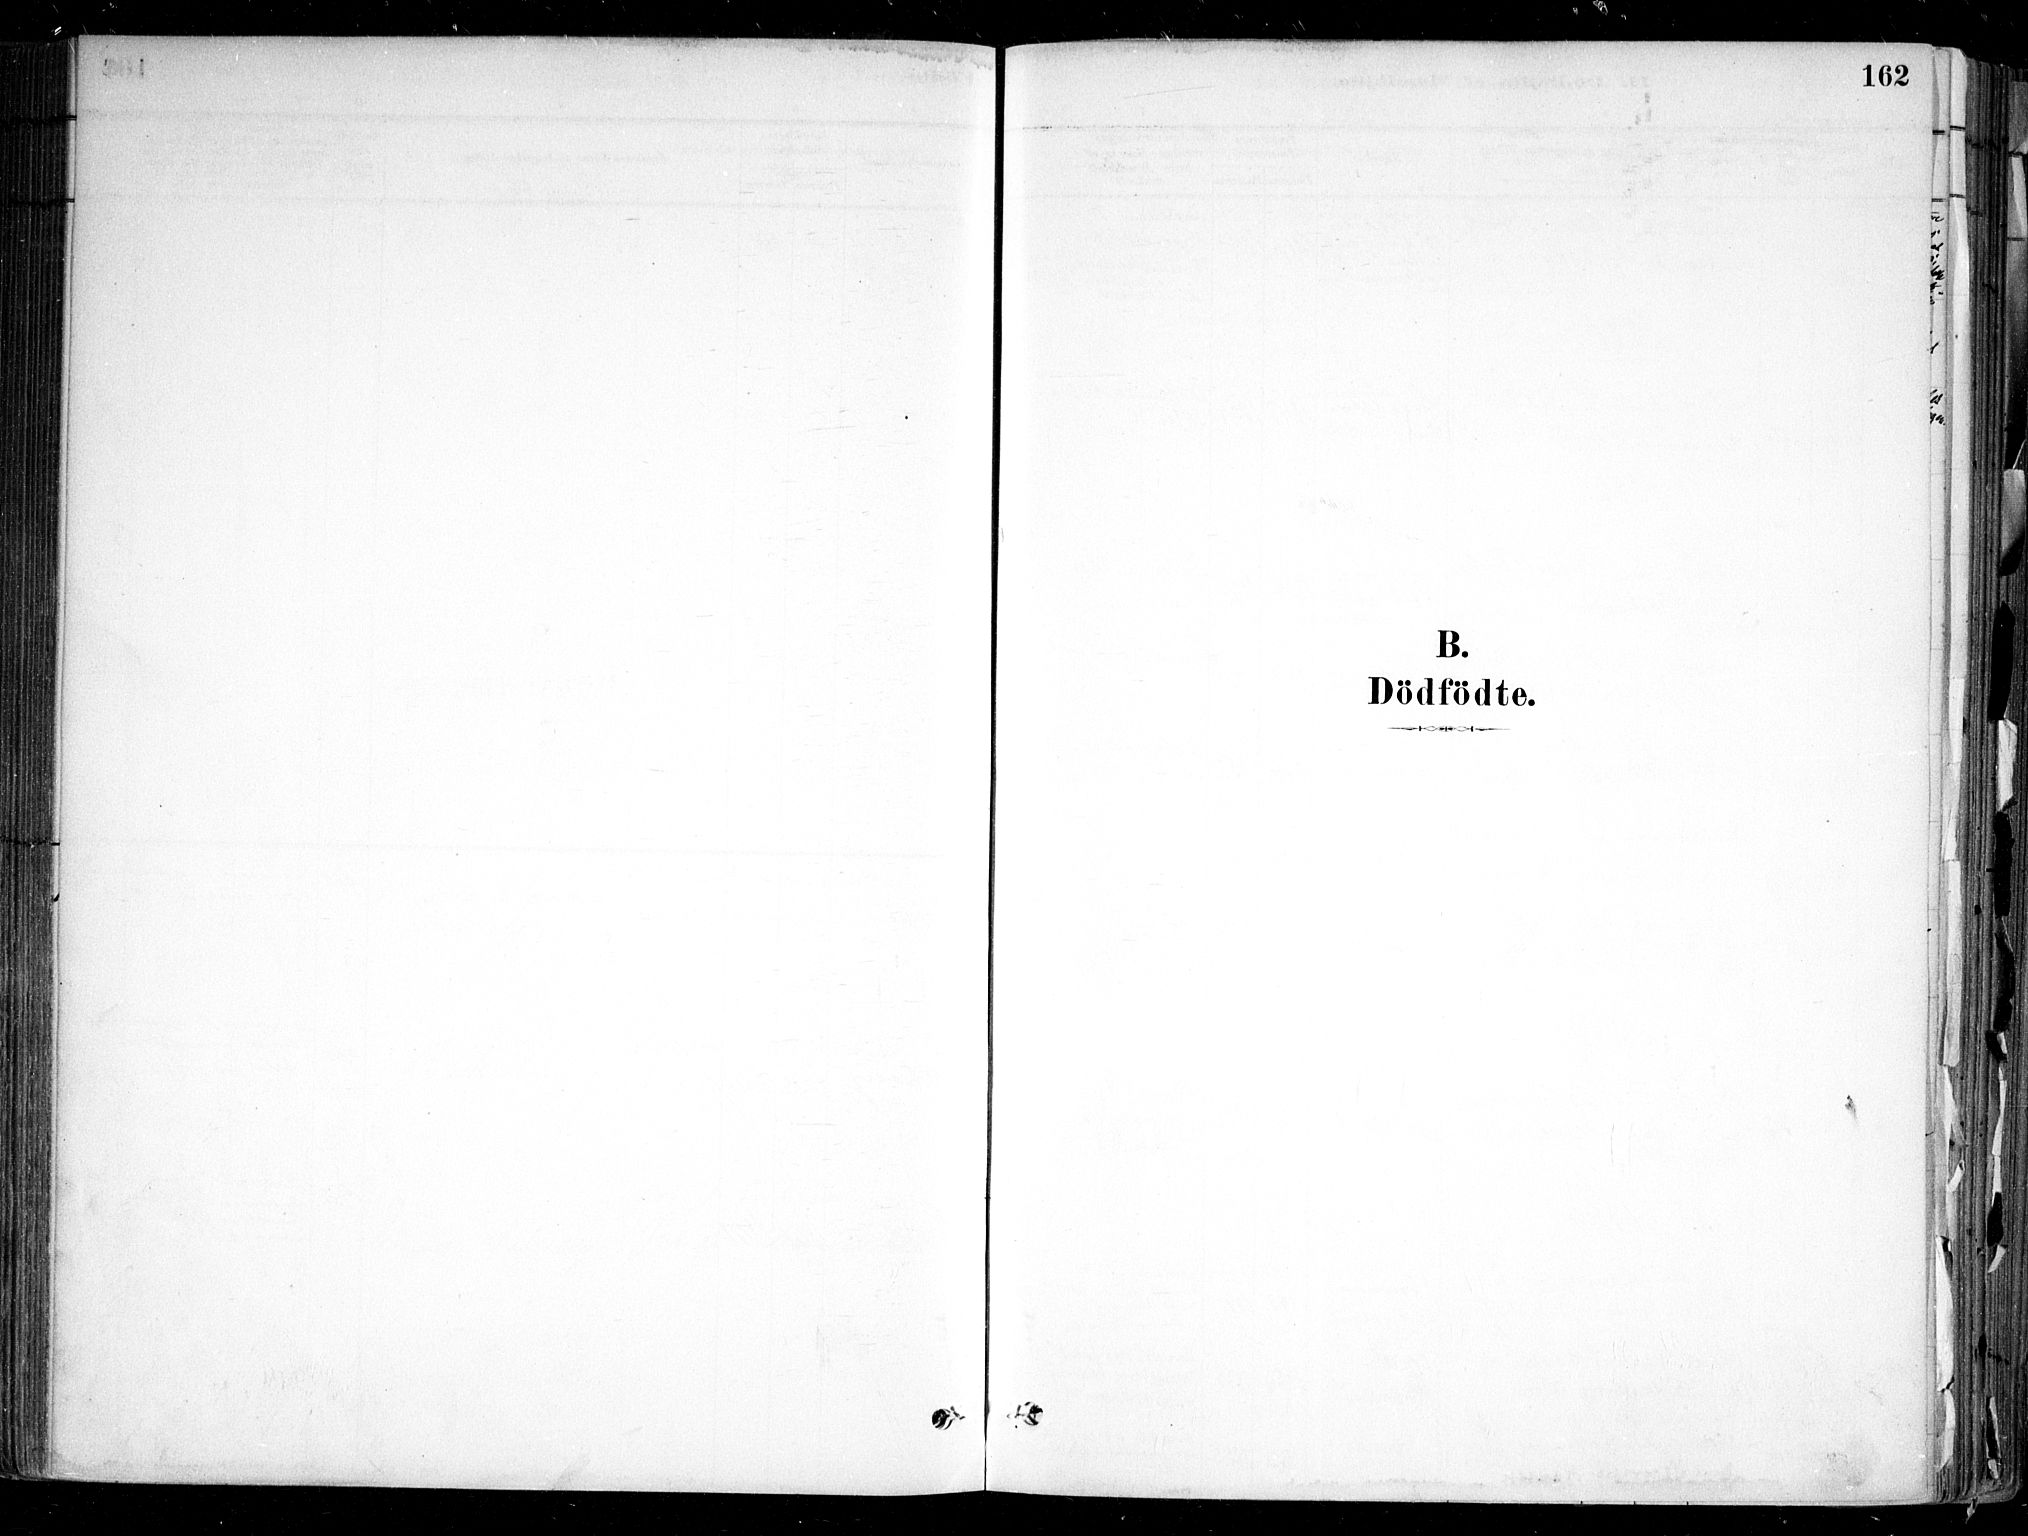 SAO, Nesodden prestekontor Kirkebøker, F/Fa/L0009: Ministerialbok nr. I 9, 1880-1915, s. 162